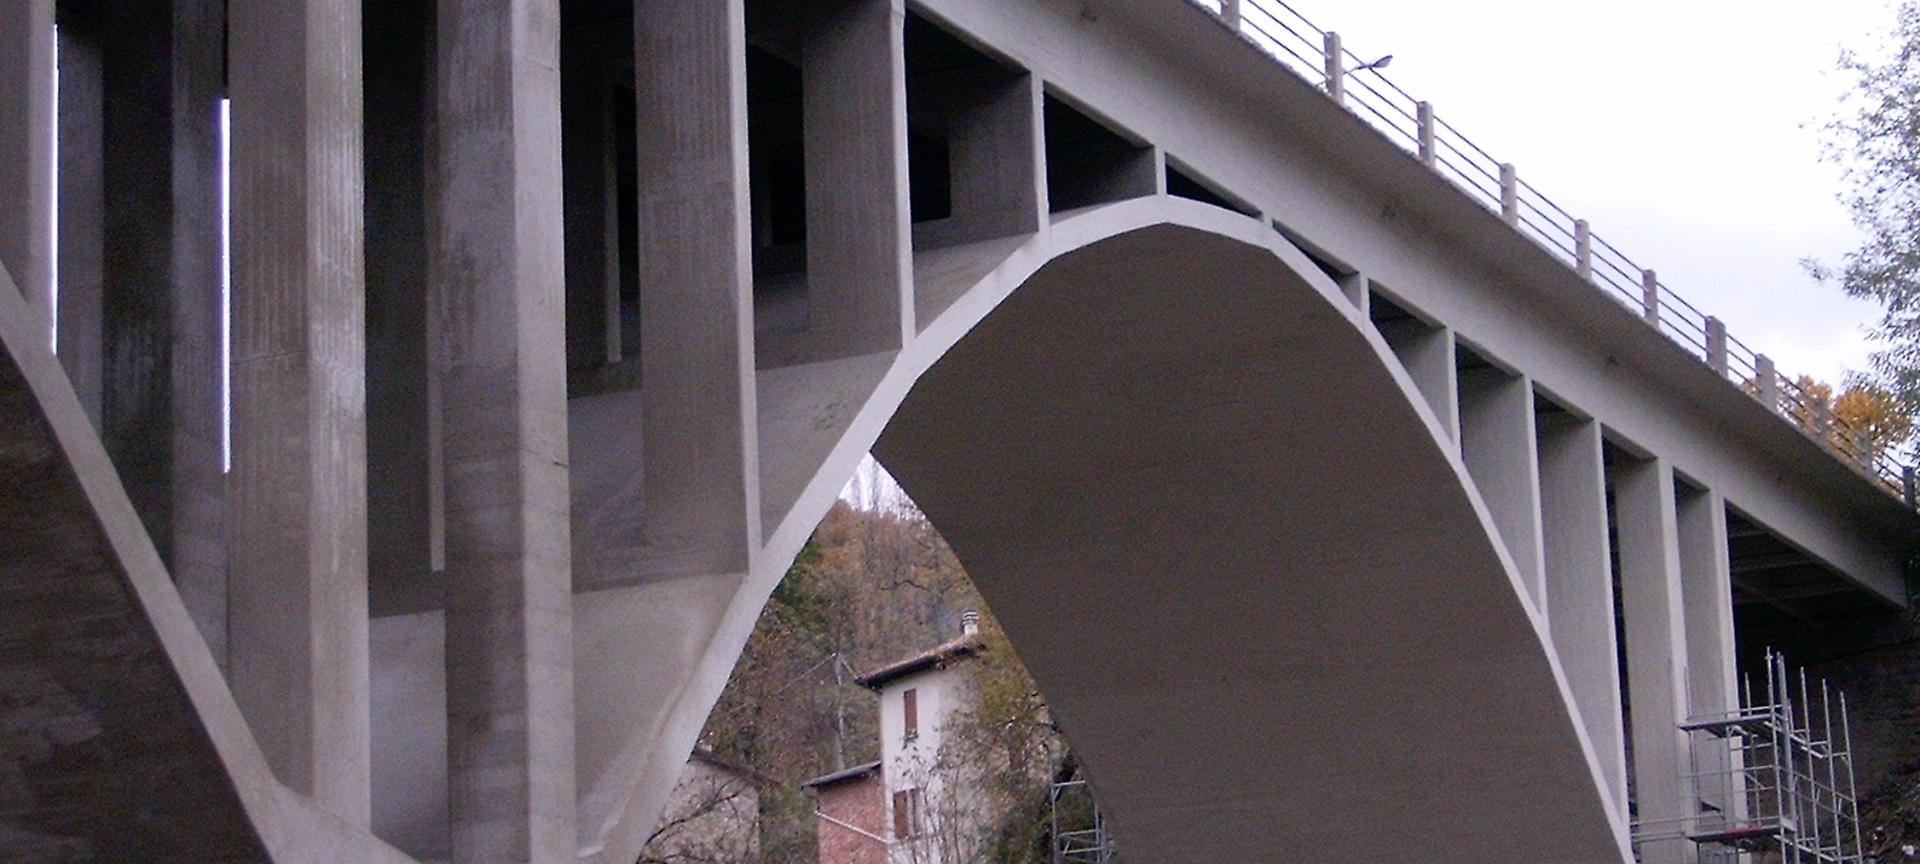 Foto: ponte. Archivio Città metropolitana di Bologna